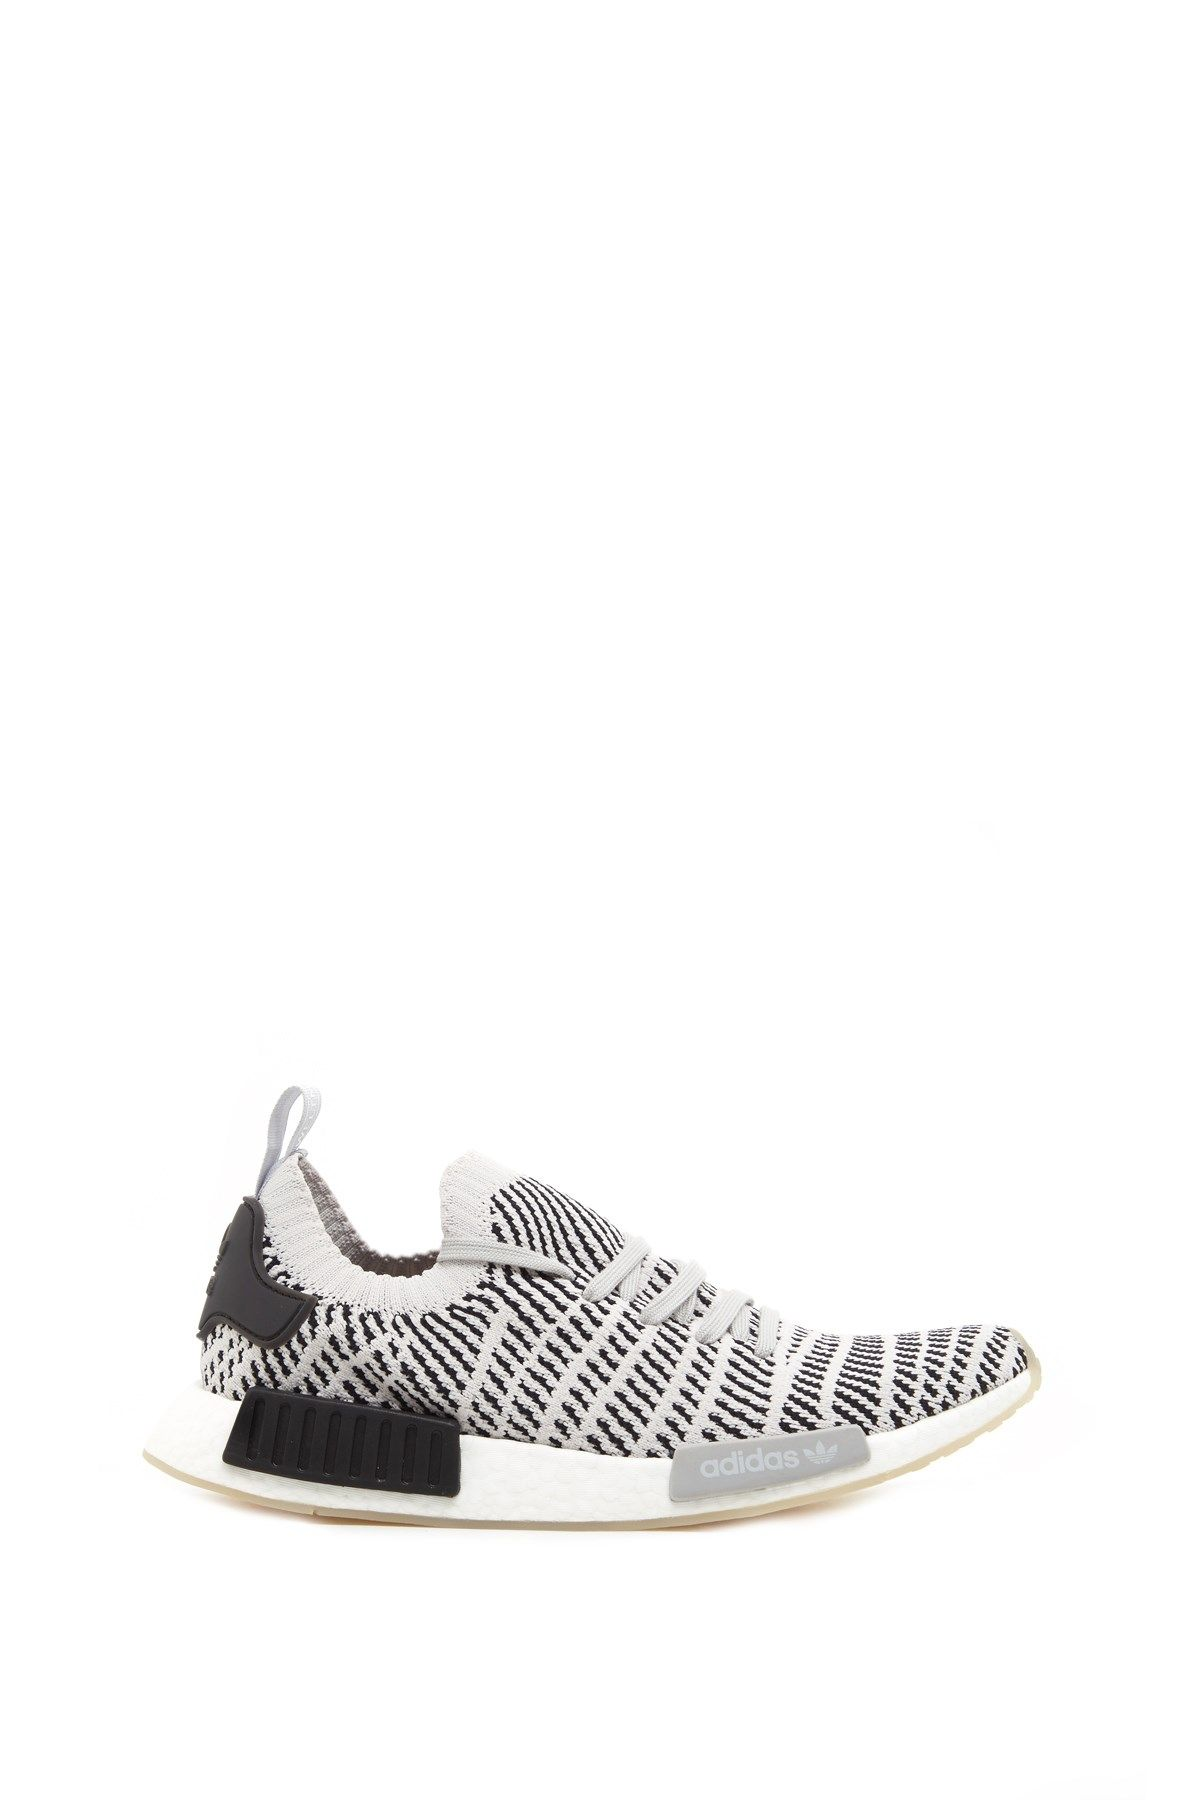 online retailer 70d23 f401b ADIDAS ORIGINALS nmd r1 pk stealth sneakers.  adidasoriginals  shoes